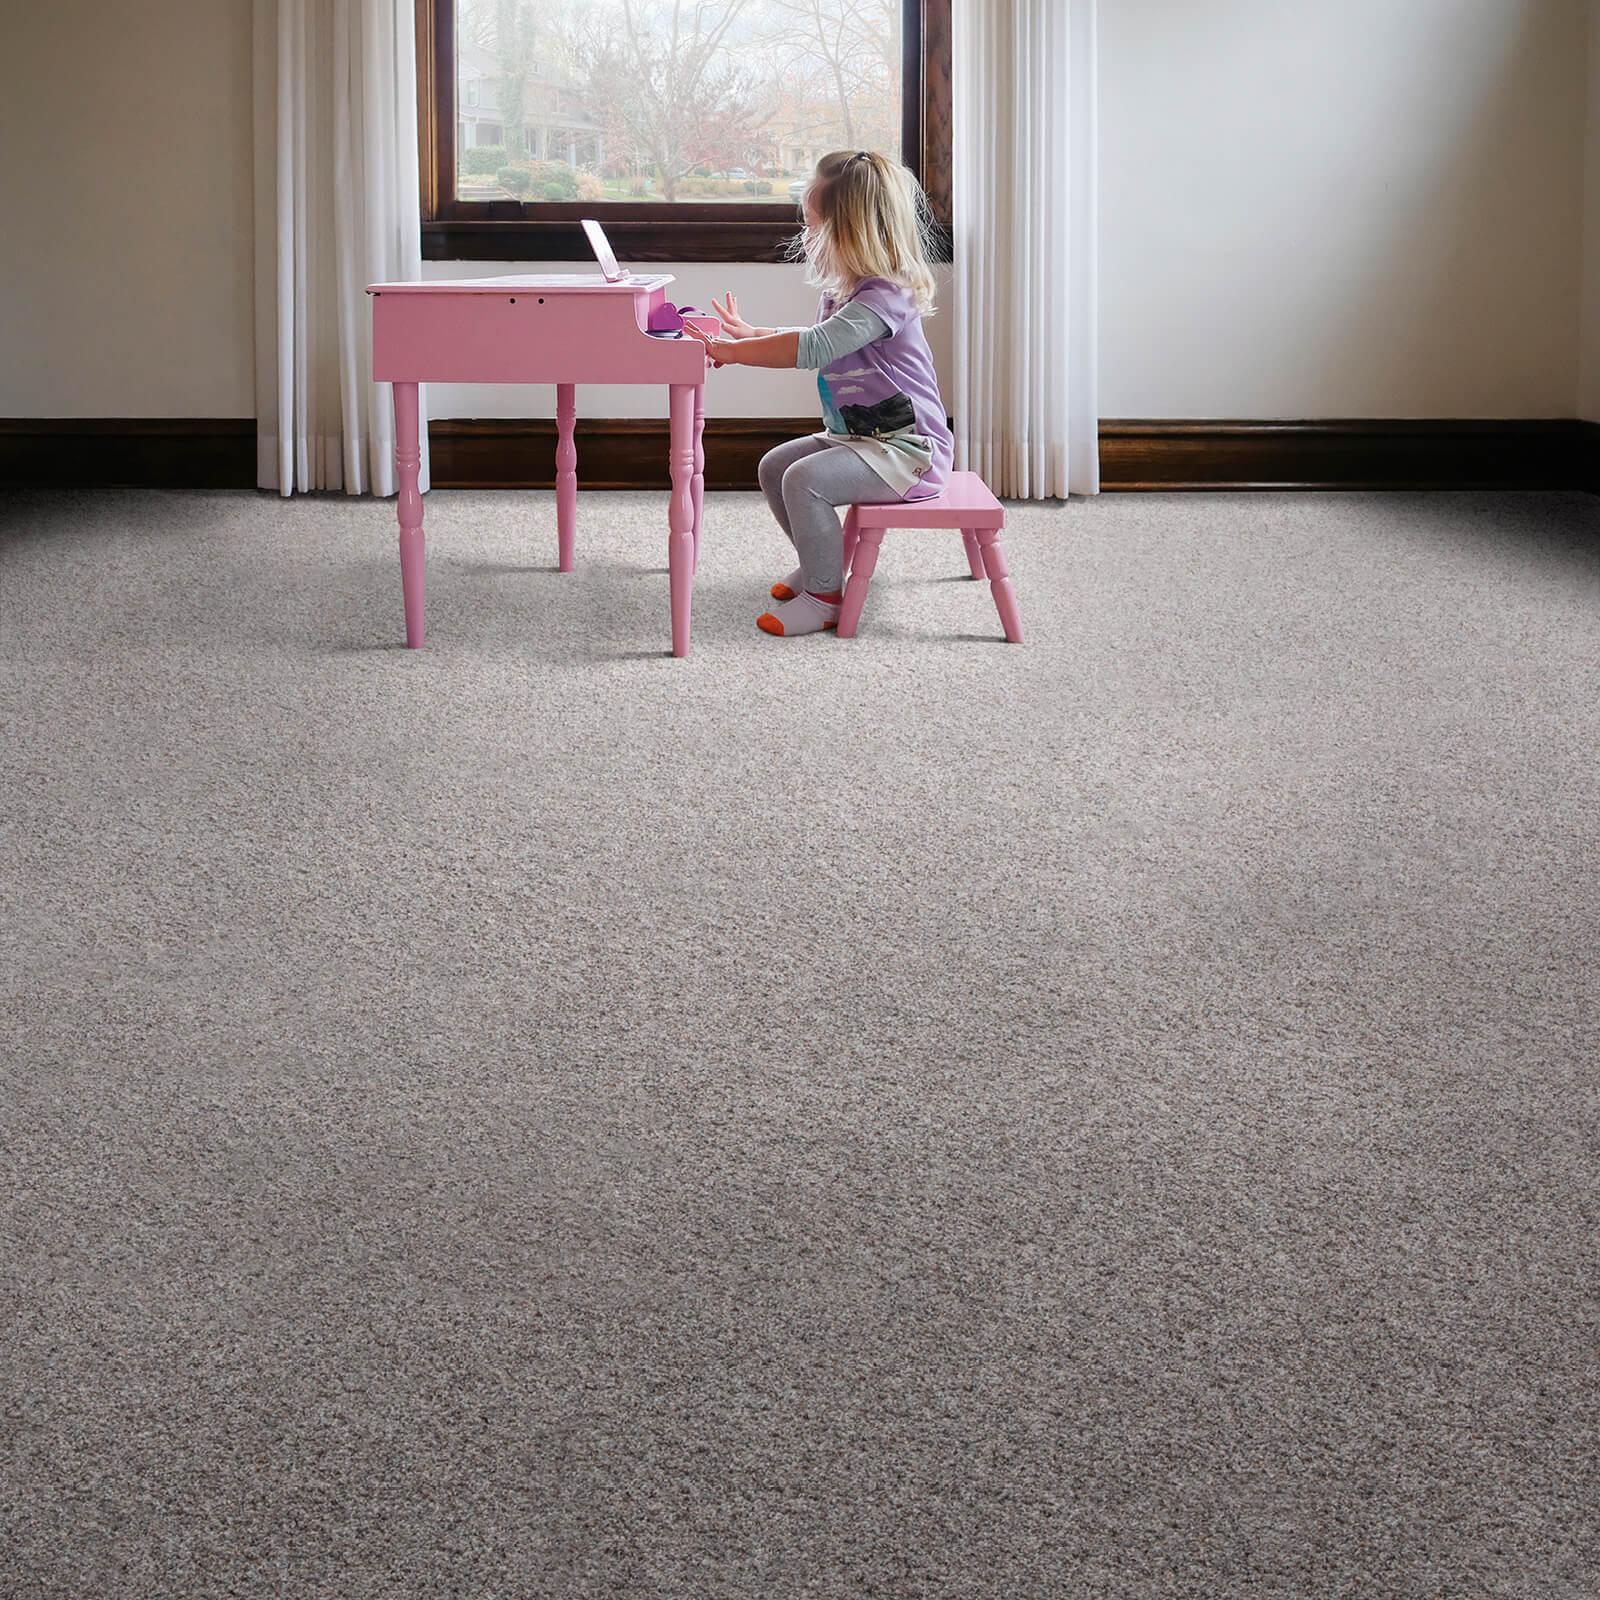 carpet | Carefree Carpets & Floors